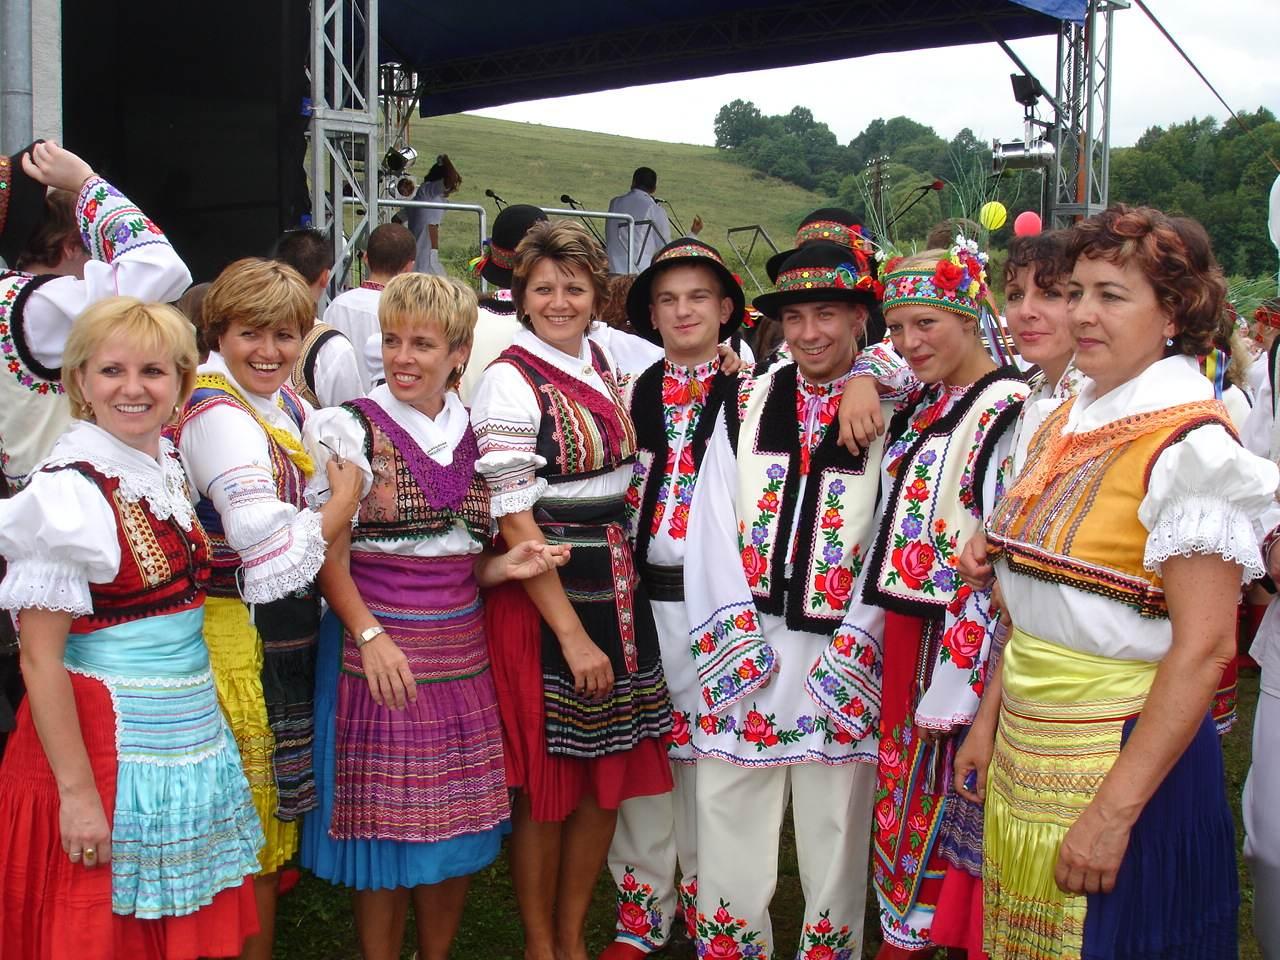 Carpatho-Rusyn_sub-groups_-_Presov_area_Lemkos_(left_side)_and_Przemyśl_area_Ukrainians_in_original_goral_folk-costumes.